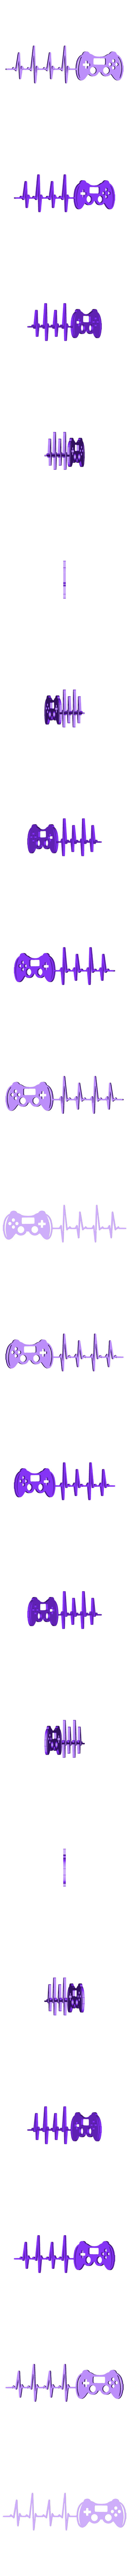 gaming.stl Download free STL file Heart Beat Gaming I Music I Climbing  2D • 3D printable template, UnpredictableLab